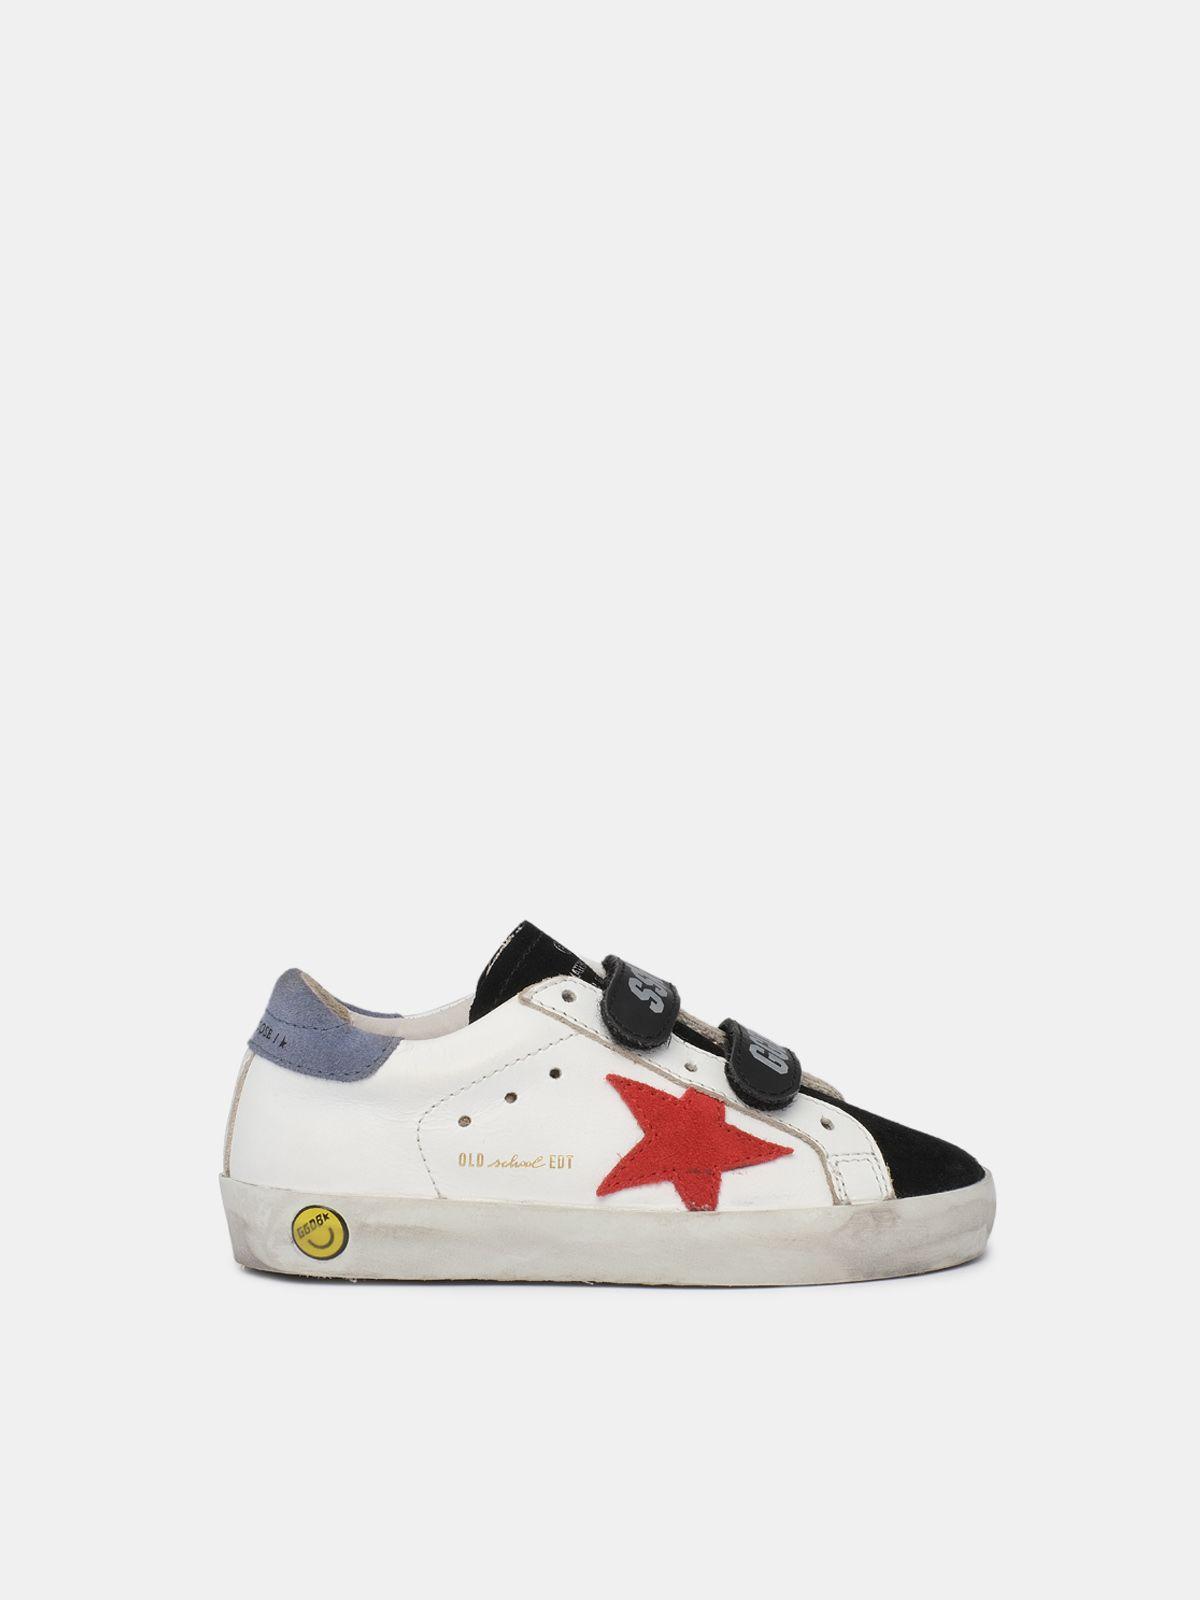 Golden Goose - Sneakers Old School bianche e nere con stella rossa in